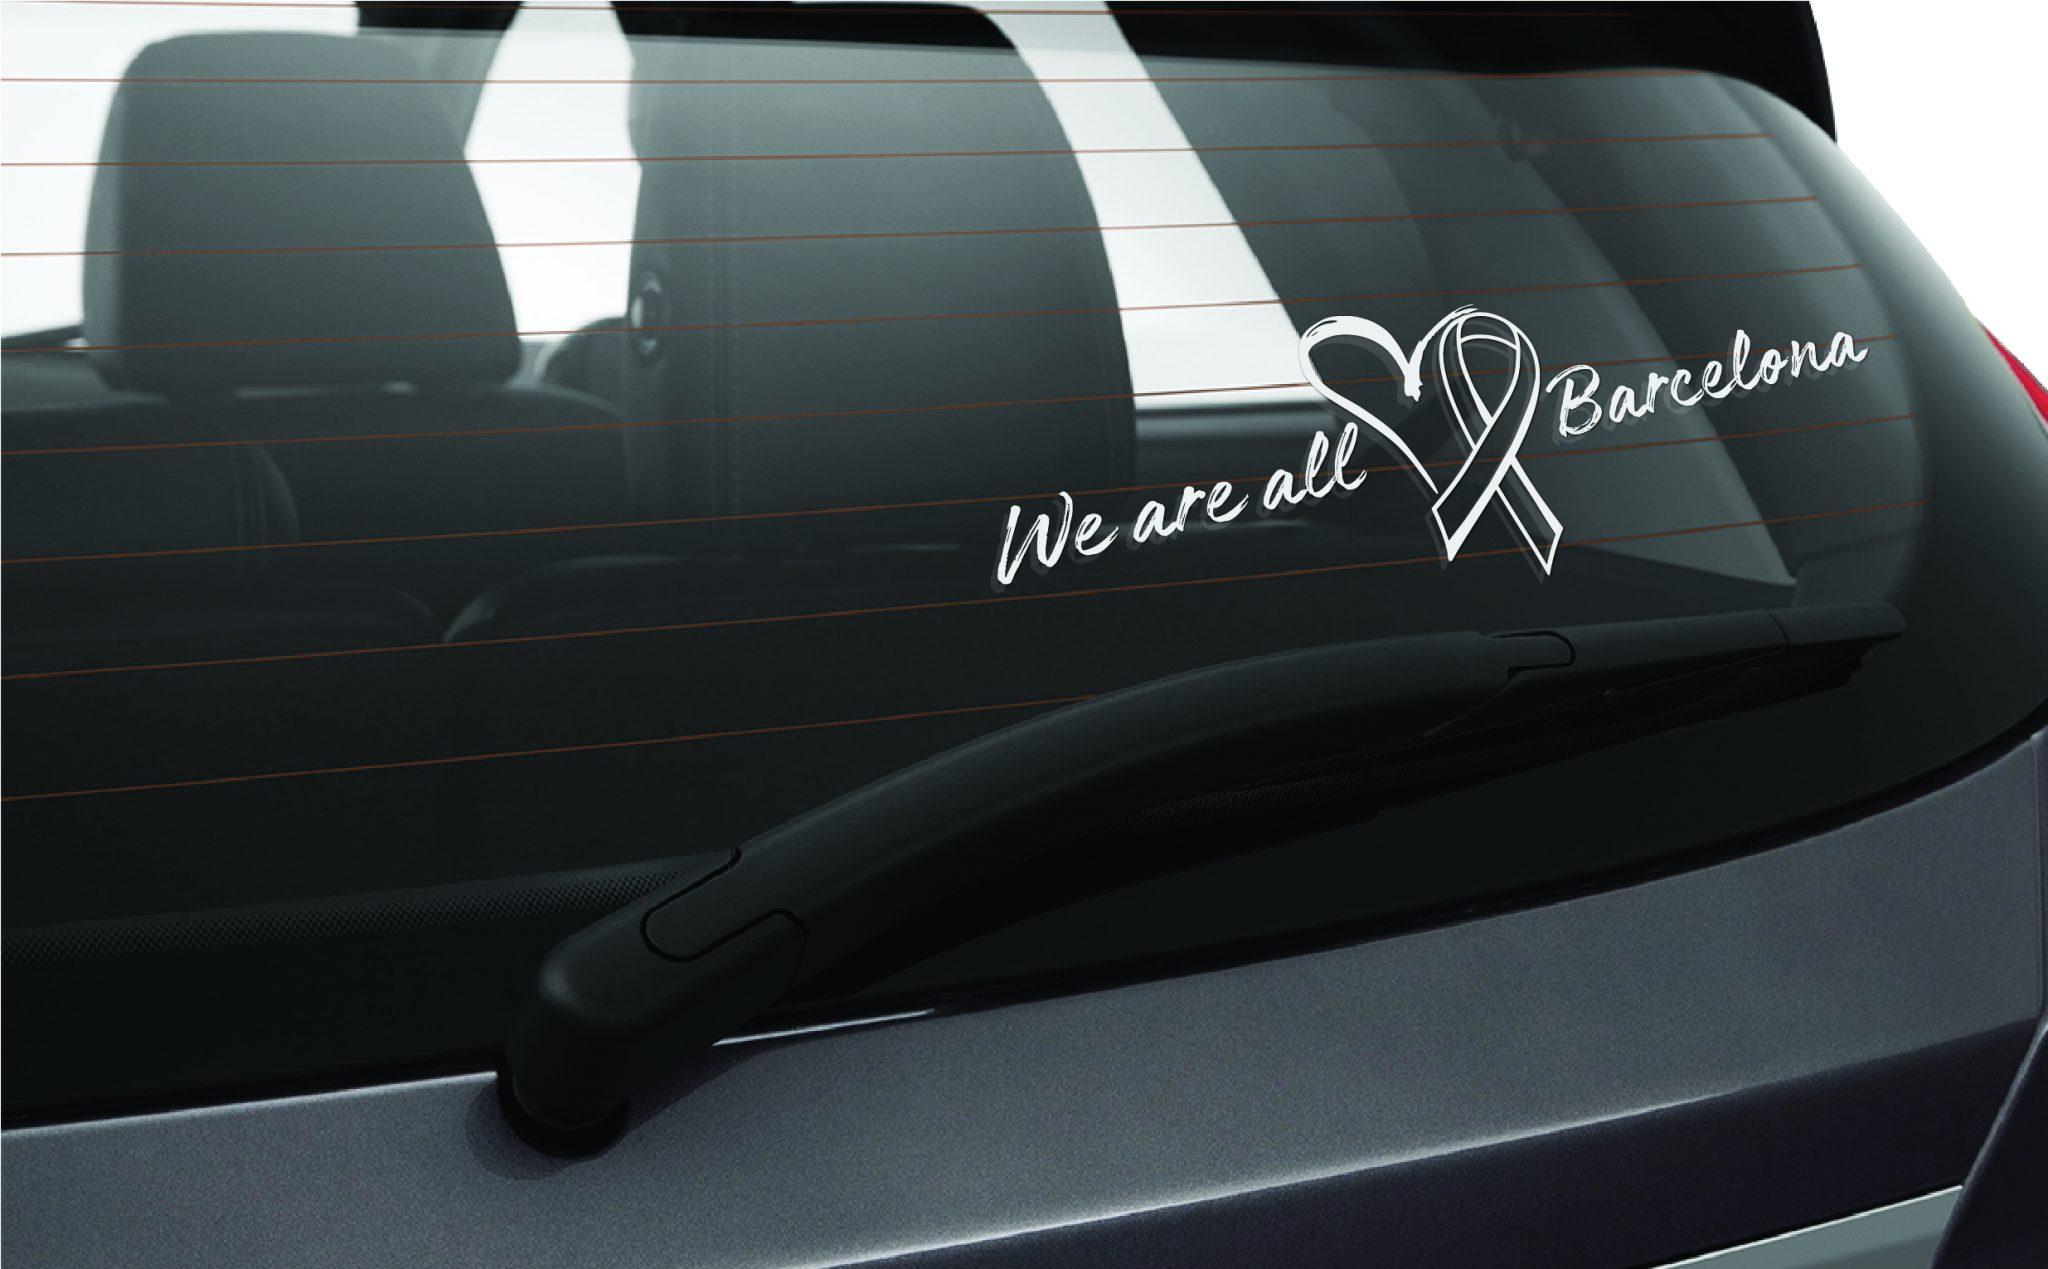 Car Window Sticker The New Sticker Design - Window stickers for carshow to read a new car window stickertischer automotive blog